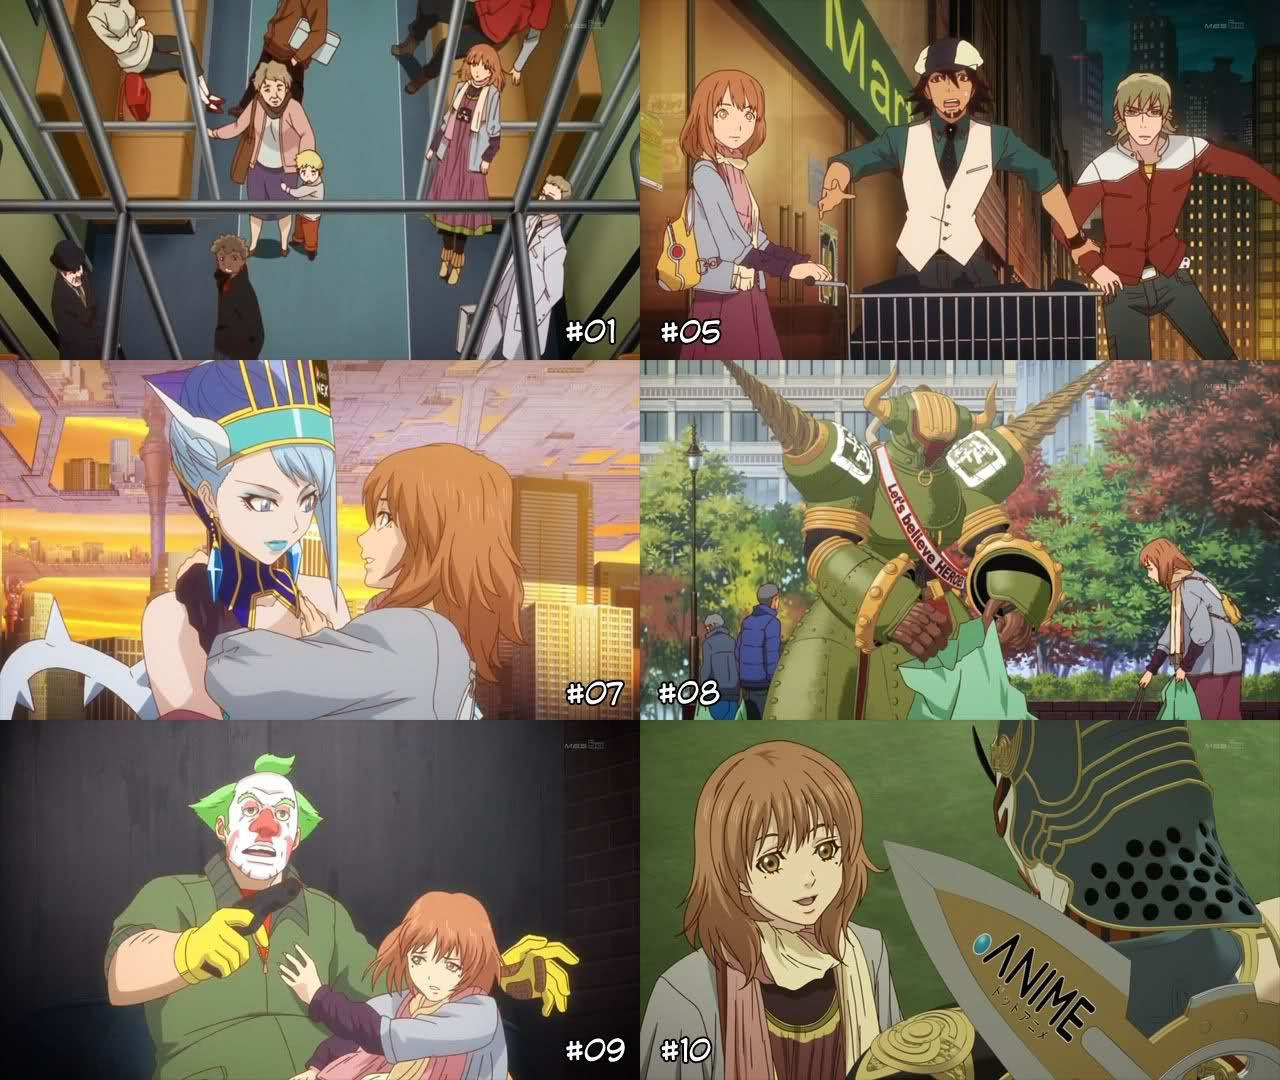 shota boy 3d anime